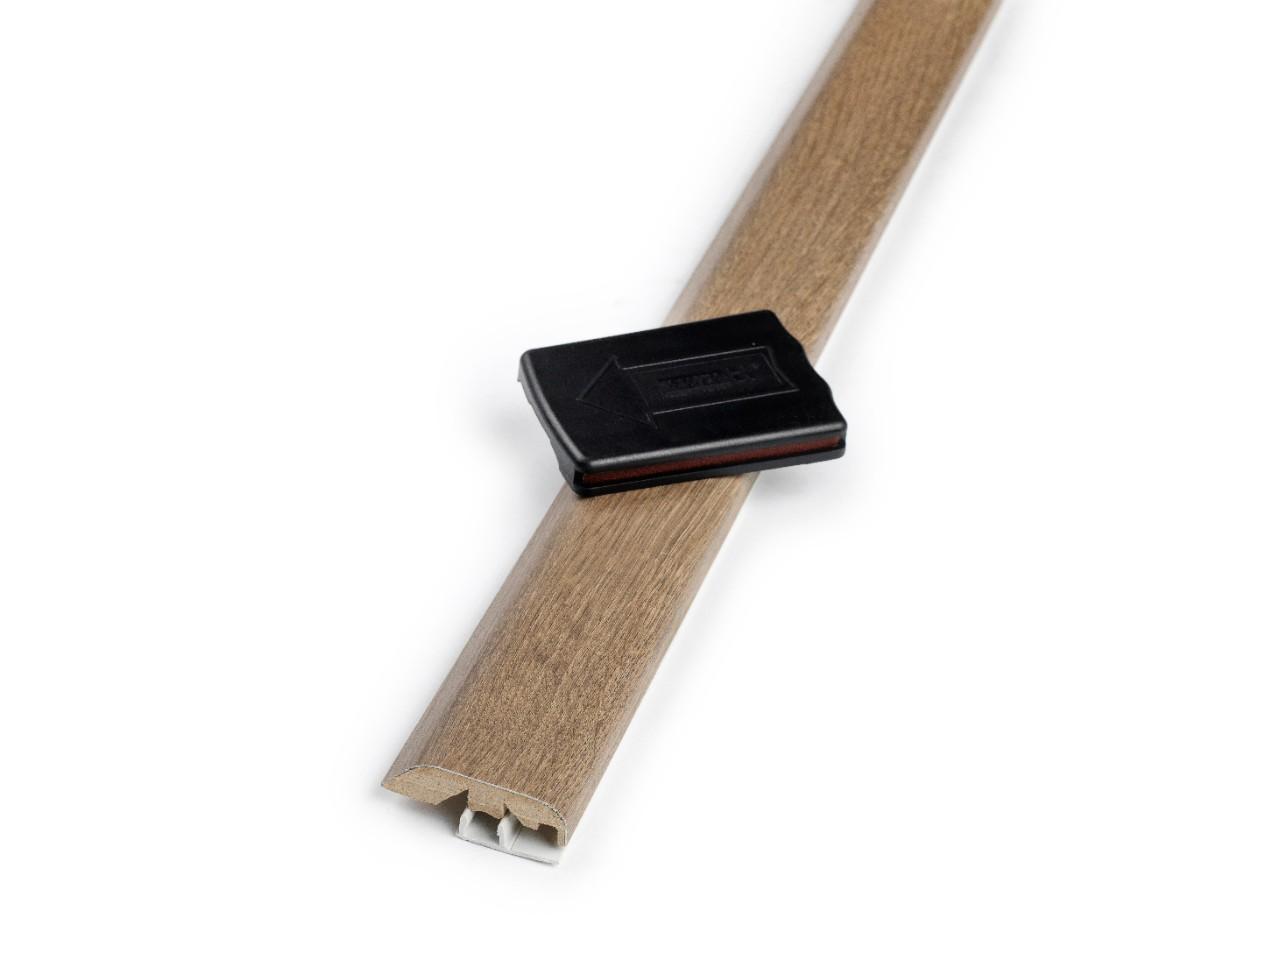 Pgincp Laminate Accessories Thermotreated Oak Pgincp01803